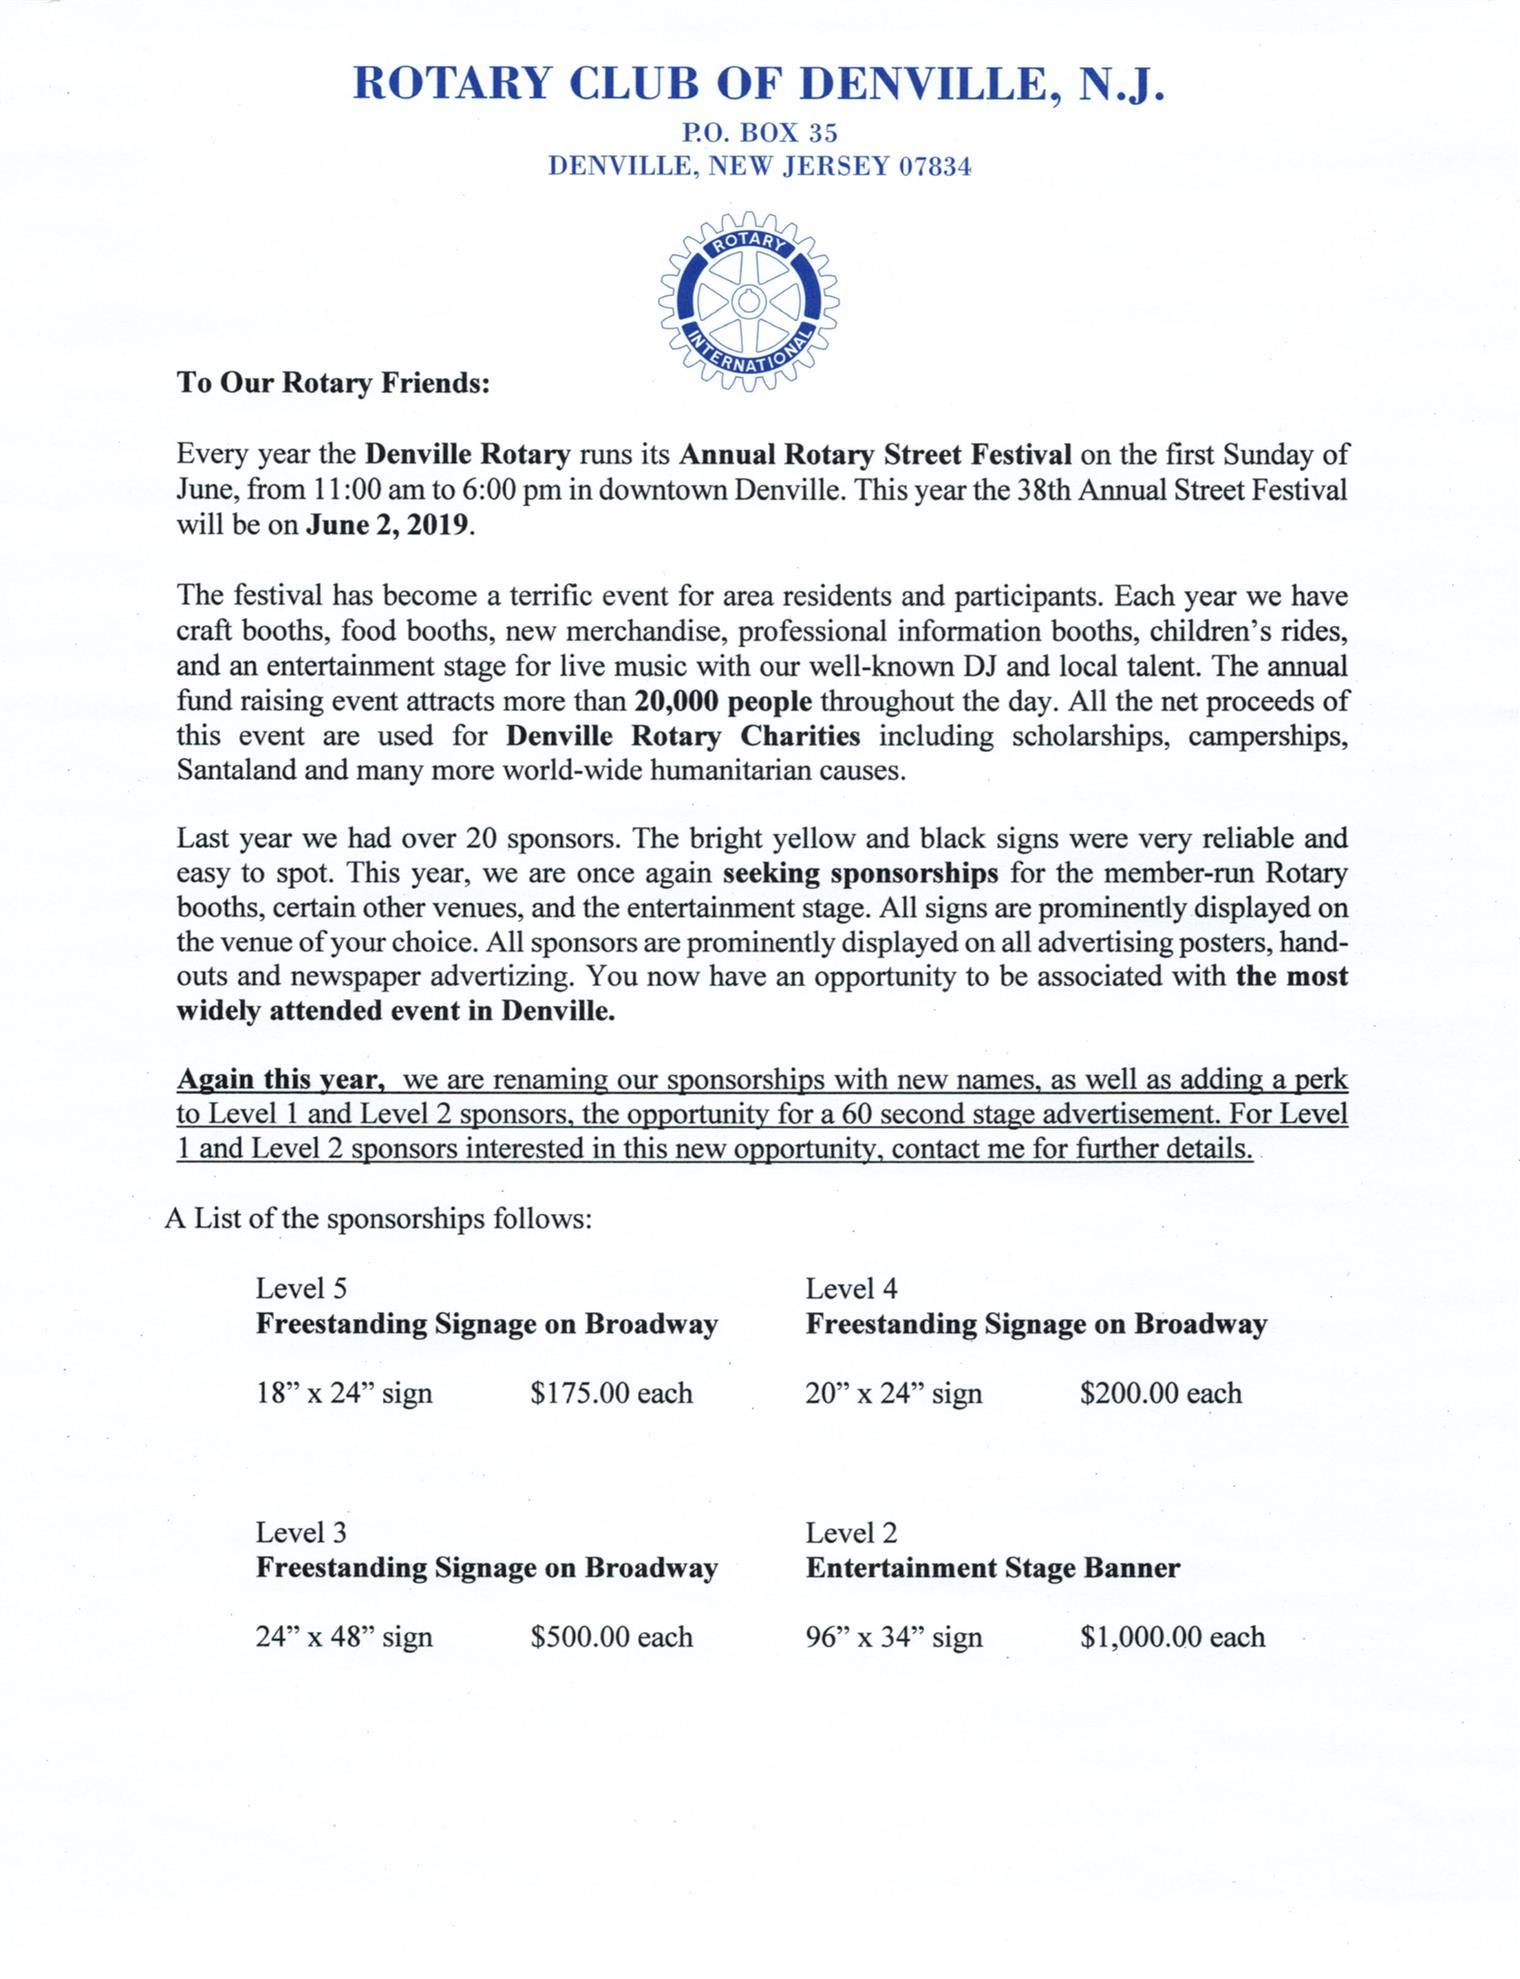 38th Annual Rotary Street Festival   Denville Rotary Club